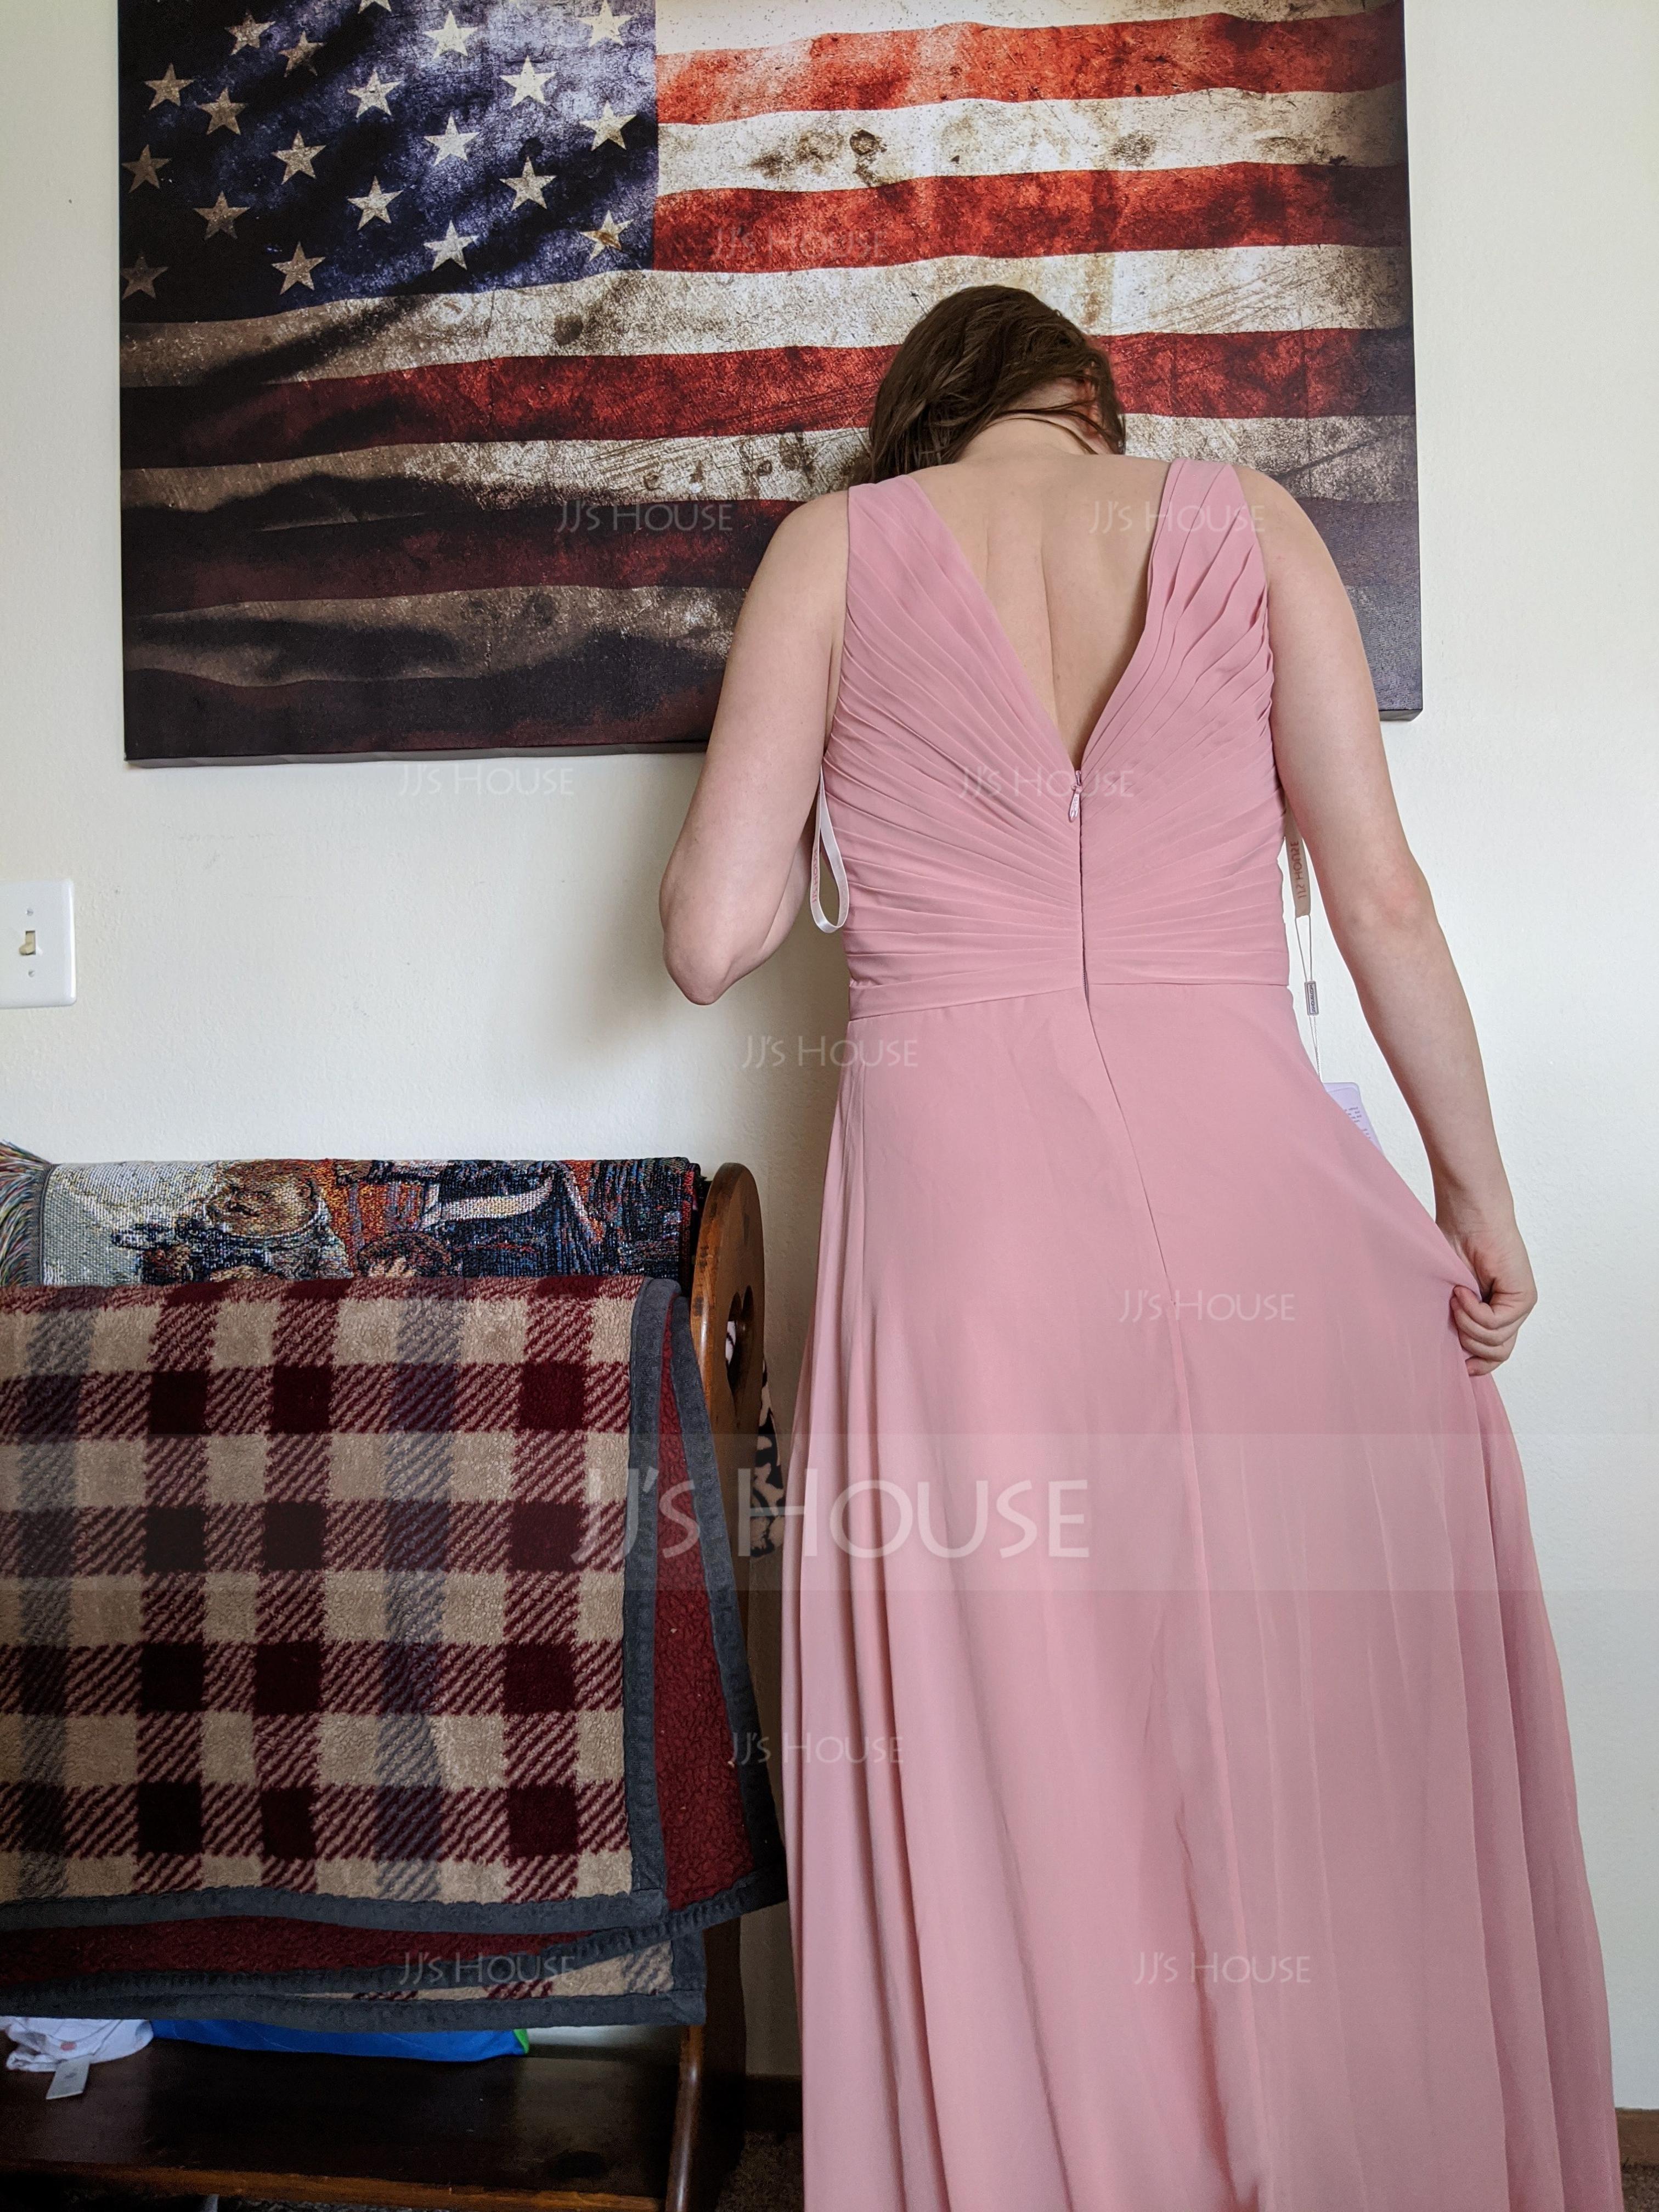 A-Lijn/Prinses V-nek Vloer lengte De Chiffon Bruidsmeisjes Jurk met Roes (007105575)